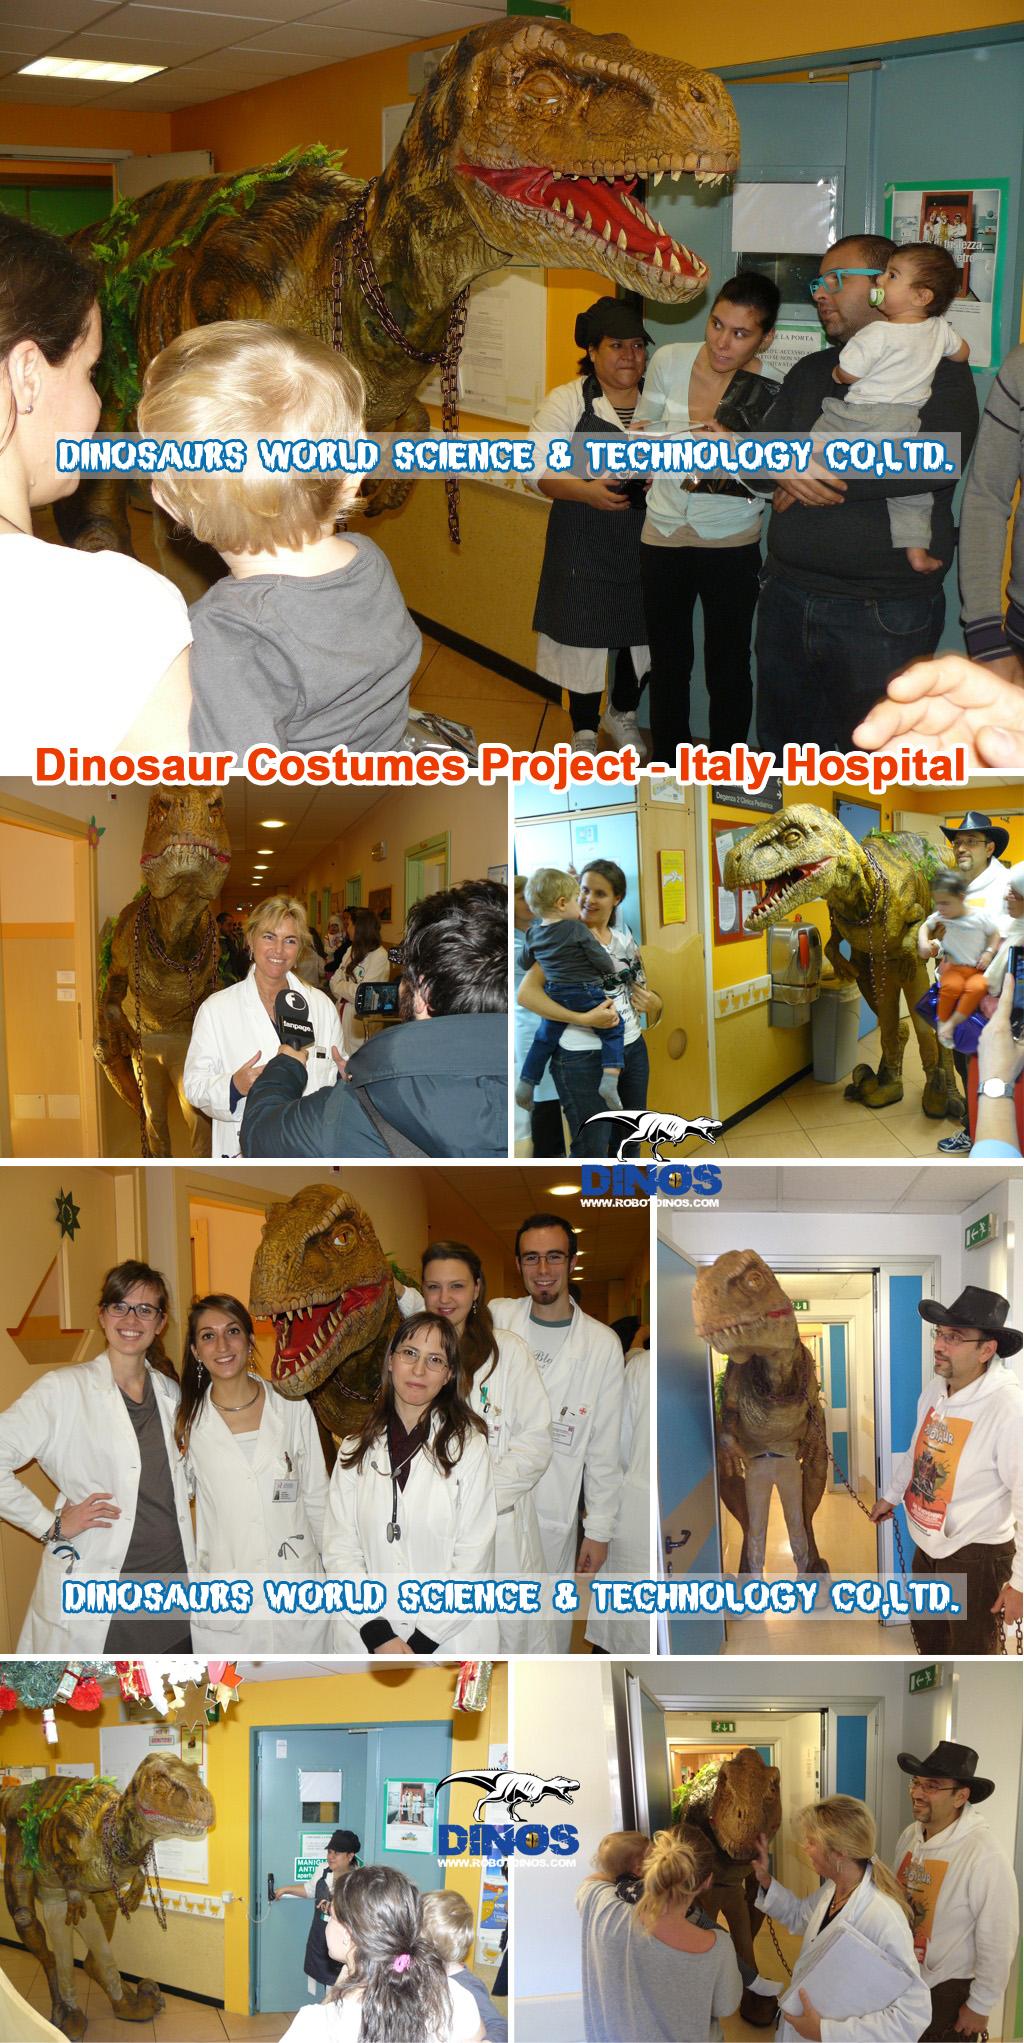 dinosaur costume,dinosaur puppet,walking with dinosaur,dinosaur suit,walking dinosaur , man wear a dinosaur and walk